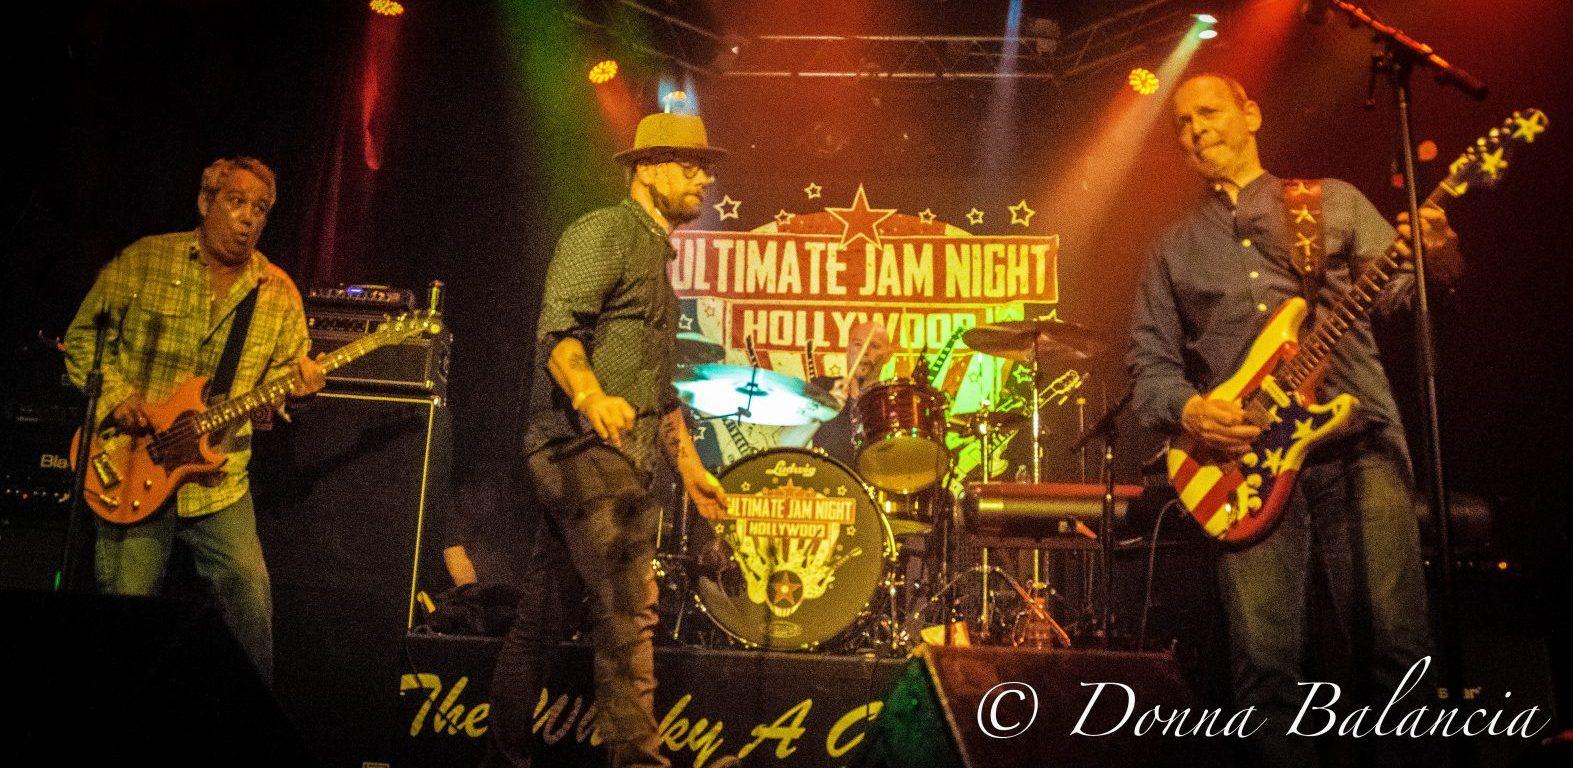 West Coast Rocker - Mike Watt, Mike Doughty, Wayne Kramer by Donna Balancia